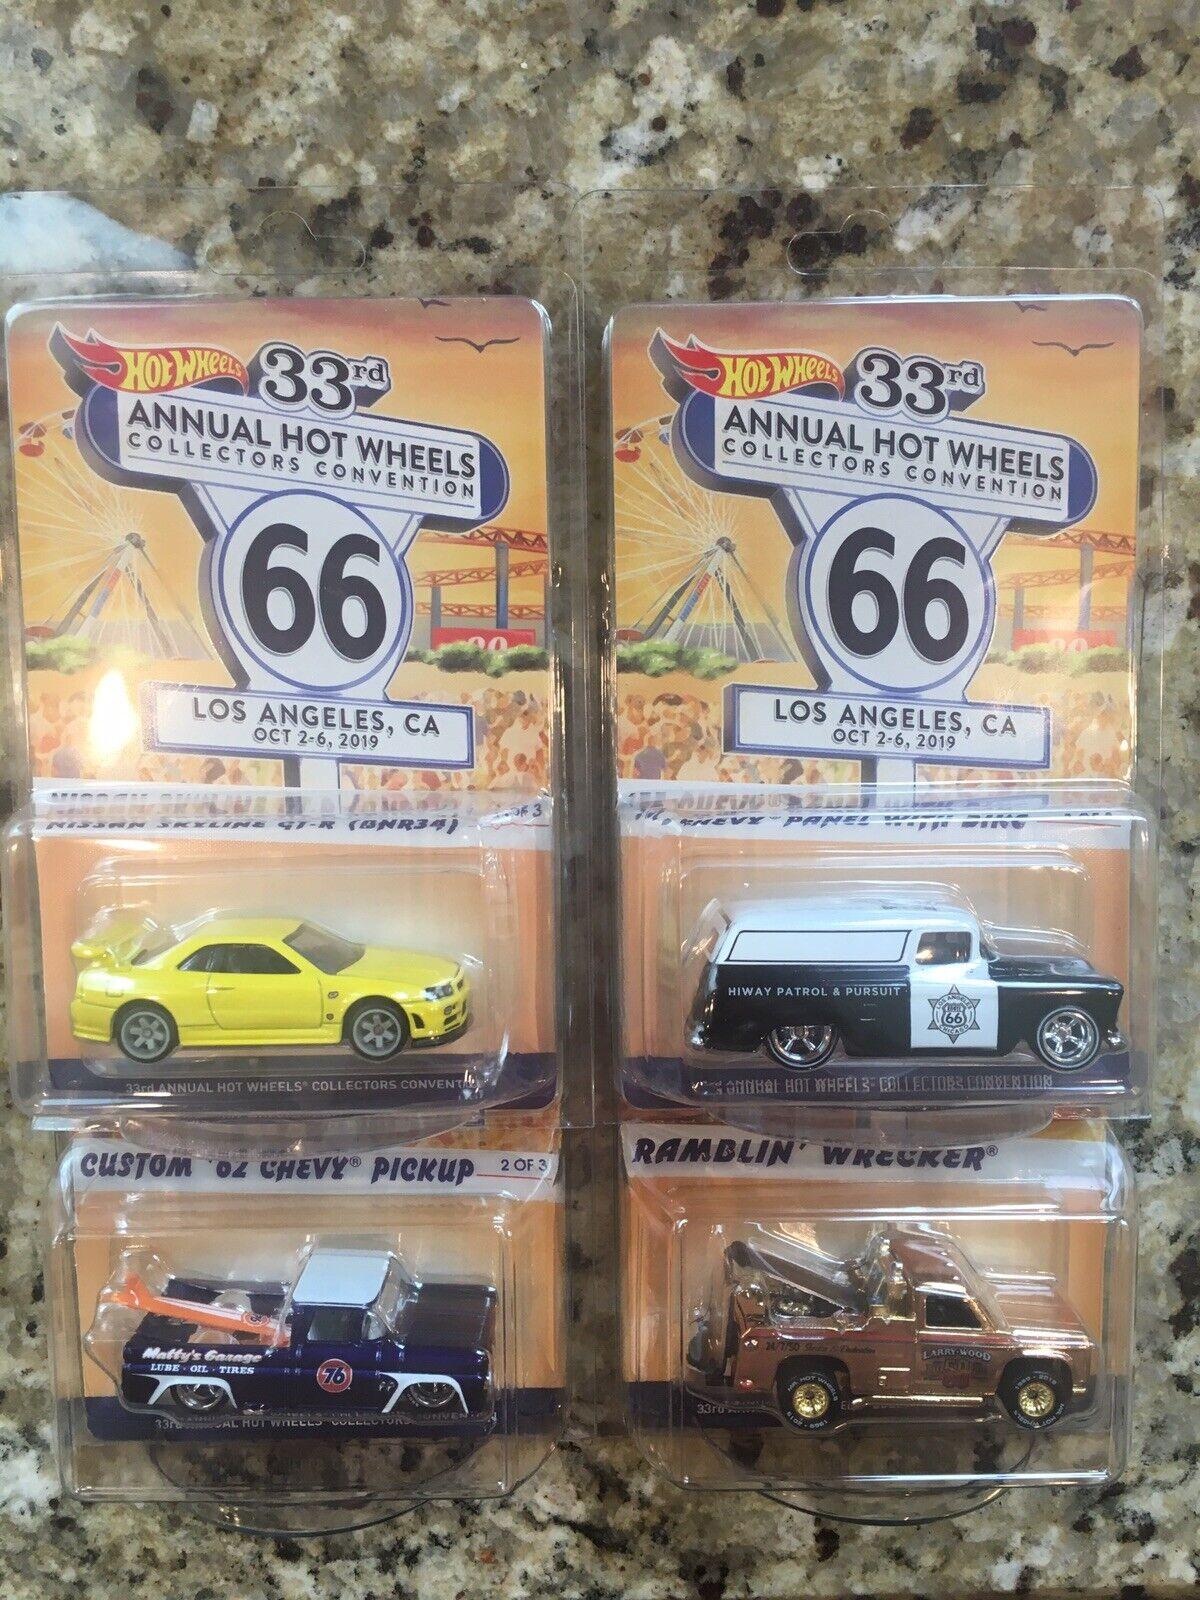 2019 Hot Wheels 33rd Convention Set of 4 Lot 55 62 Chevys Nissan Skyline Wrecker